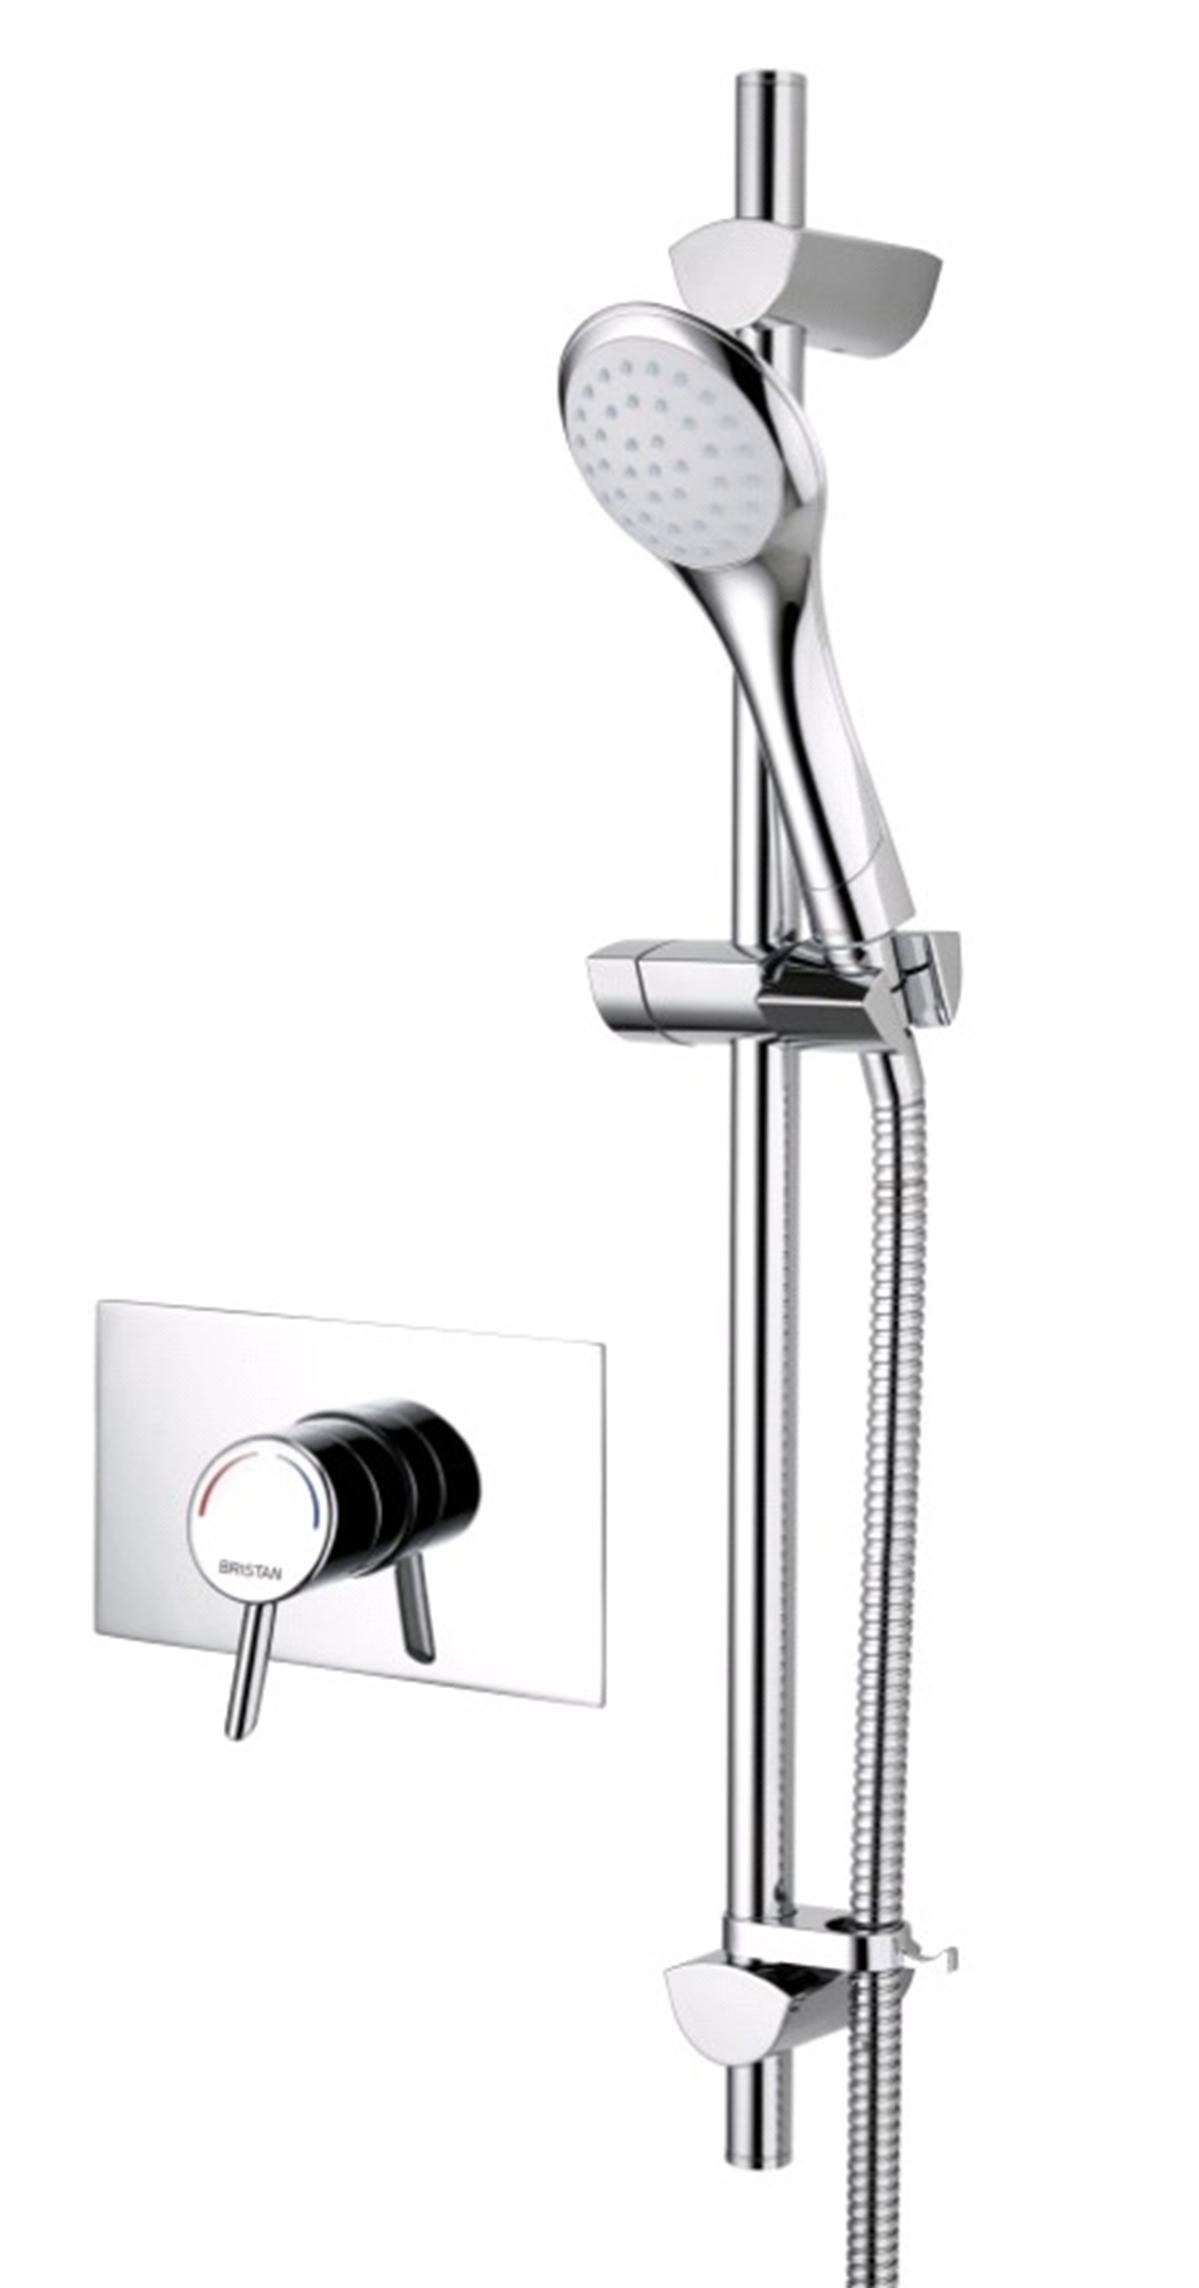 Bristan | Acute | AE SHCAR C | Complete Shower